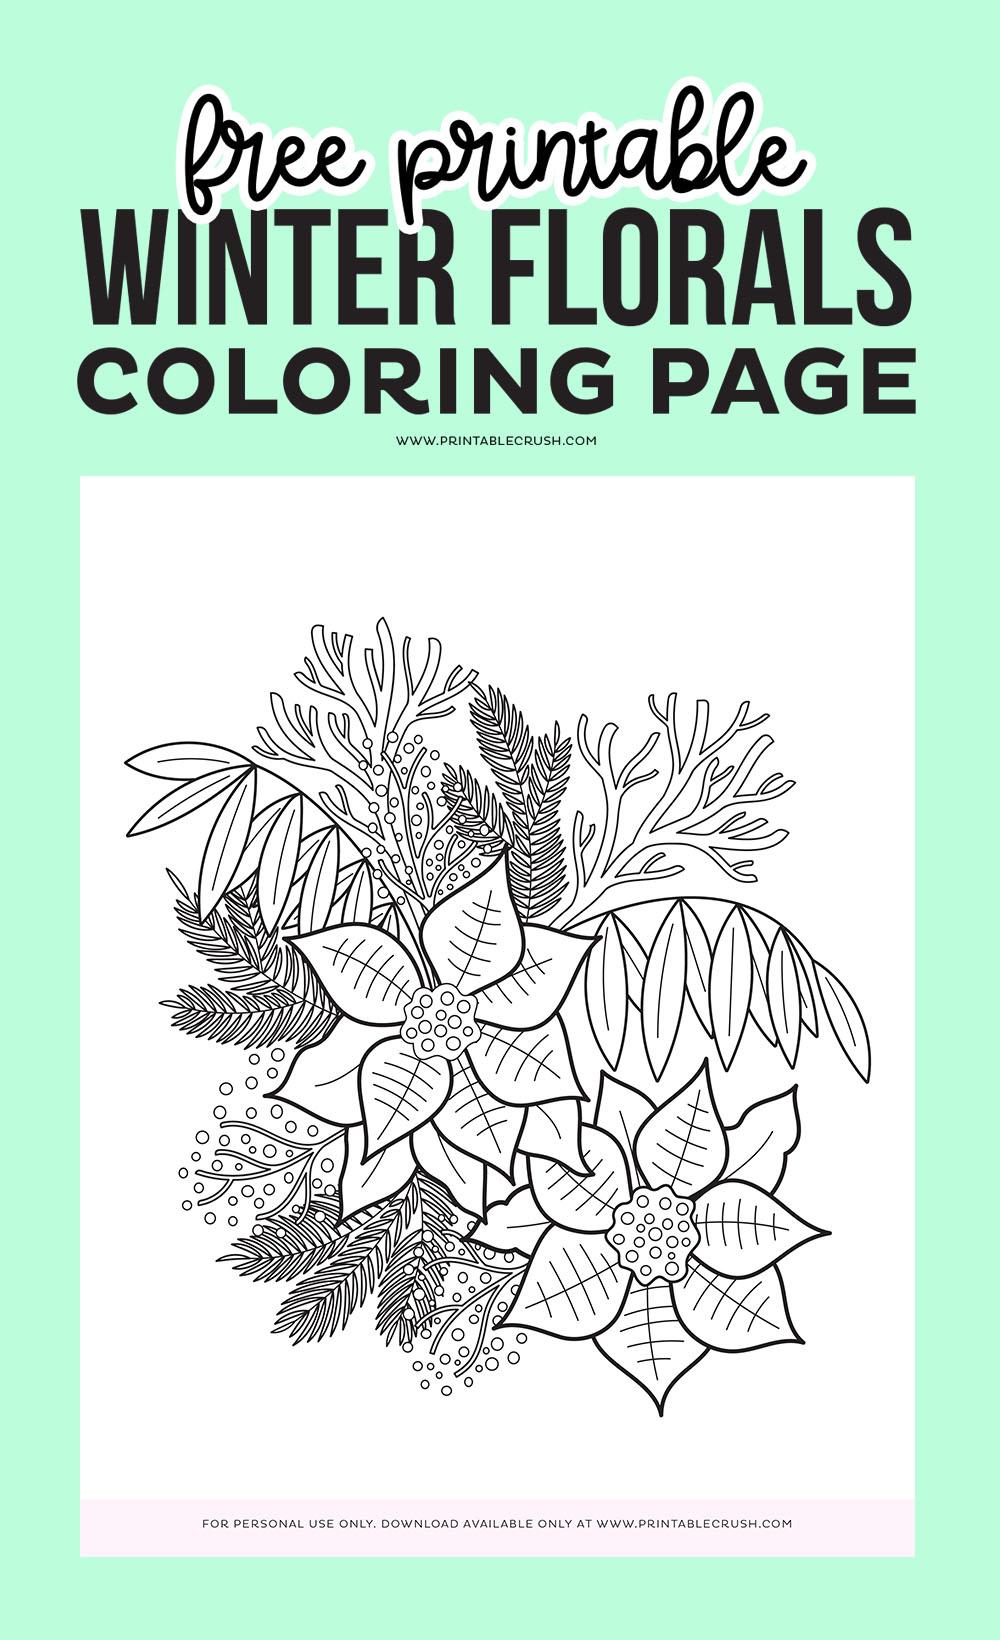 Free Printable Winter Flroals Coloring Page - Winter Florals Coloring Sheet - Free Coloring Sheet - Printable Crush